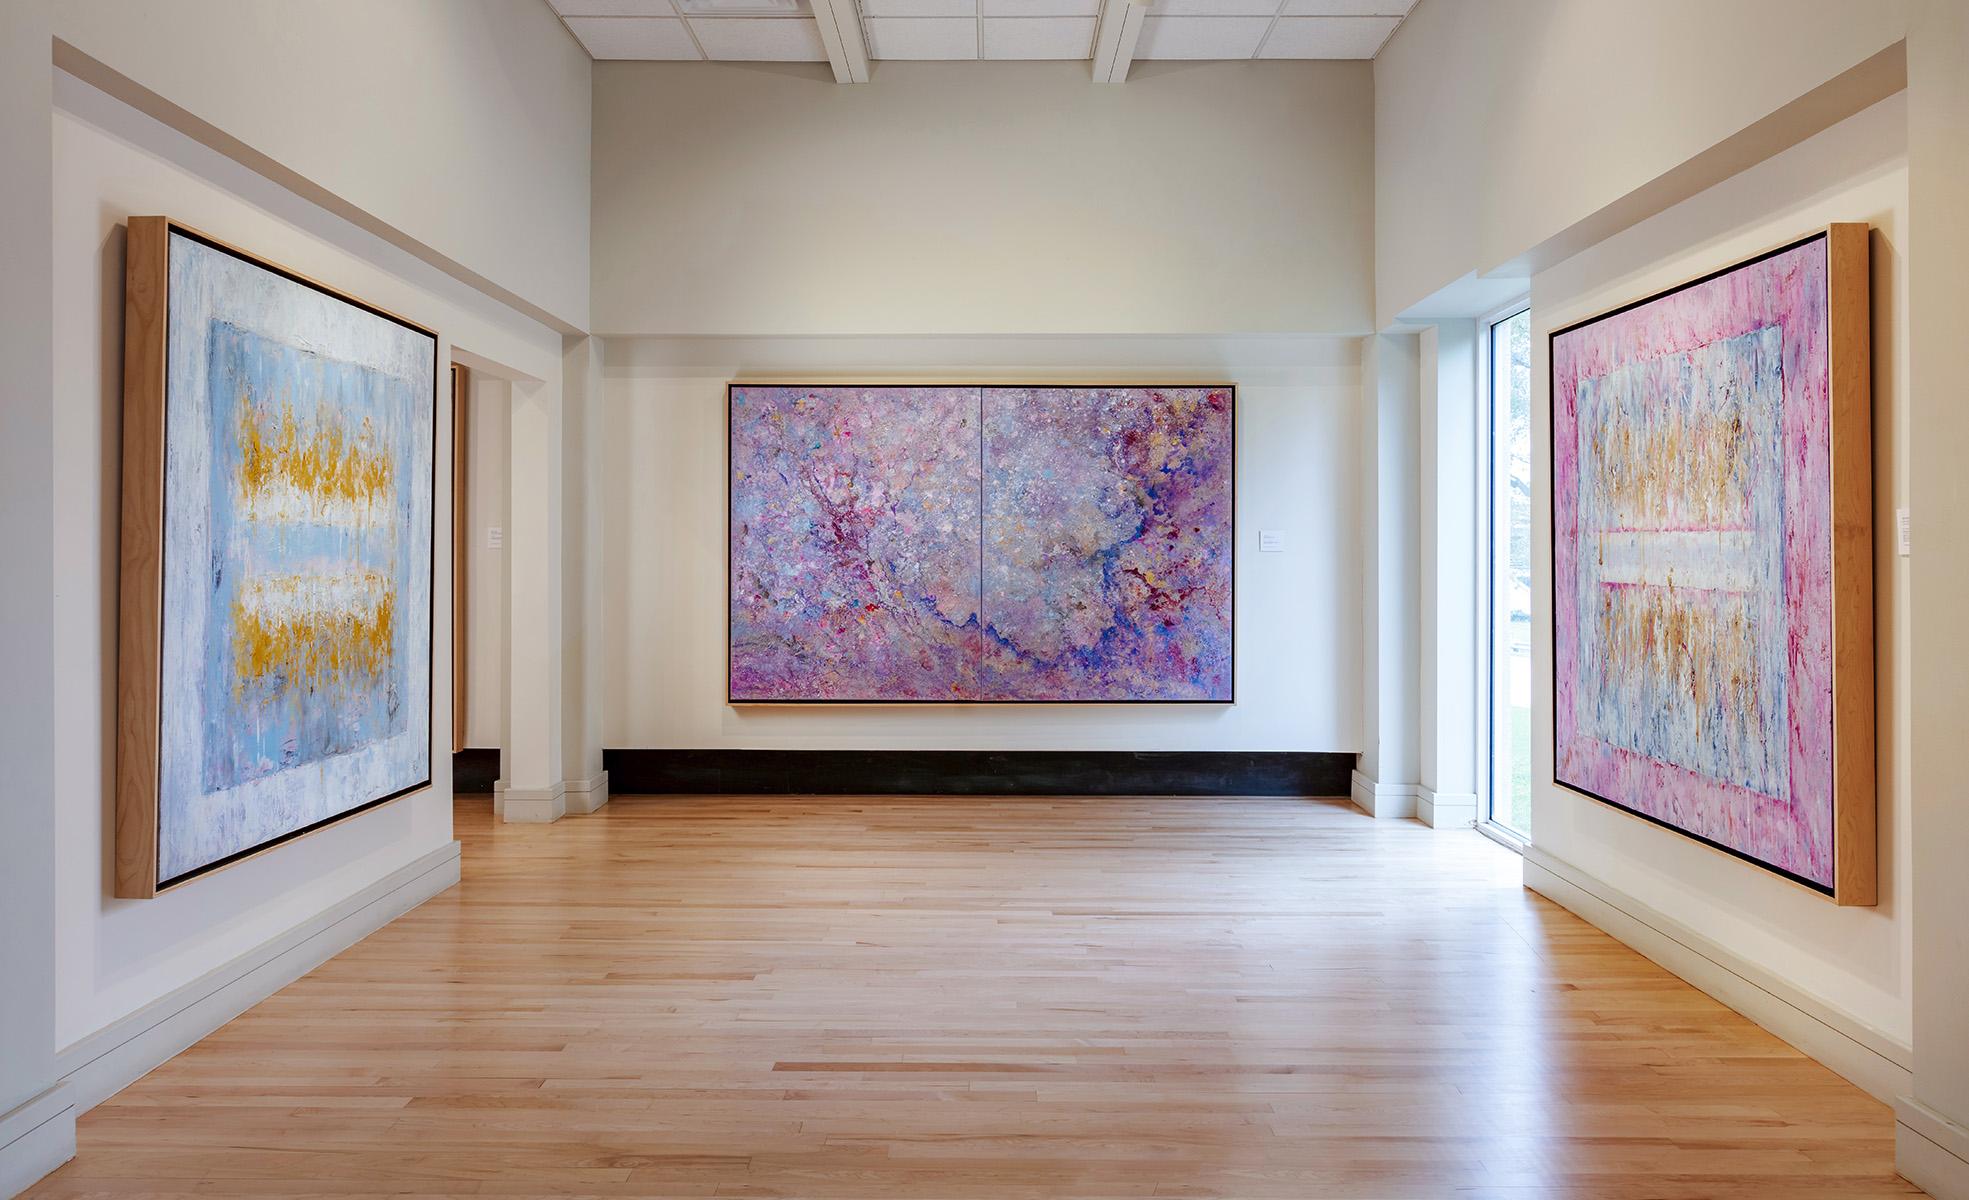 20190318_CoralSpringsMuseum_Krutick_F010 web.jpg